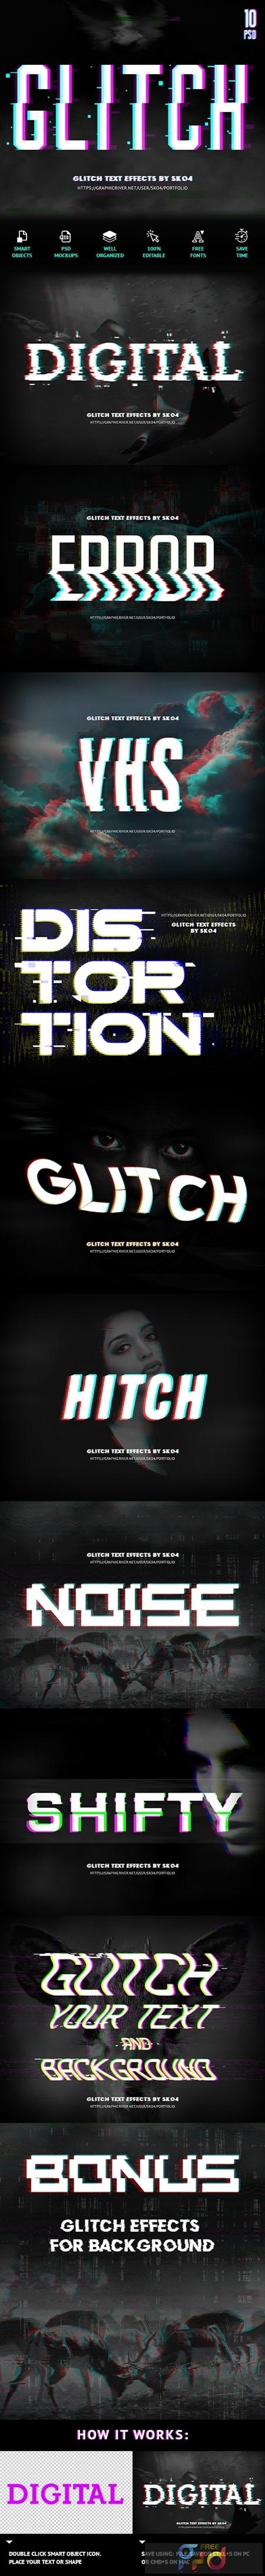 Glitch Text + Glitch Background FX 22420785 1